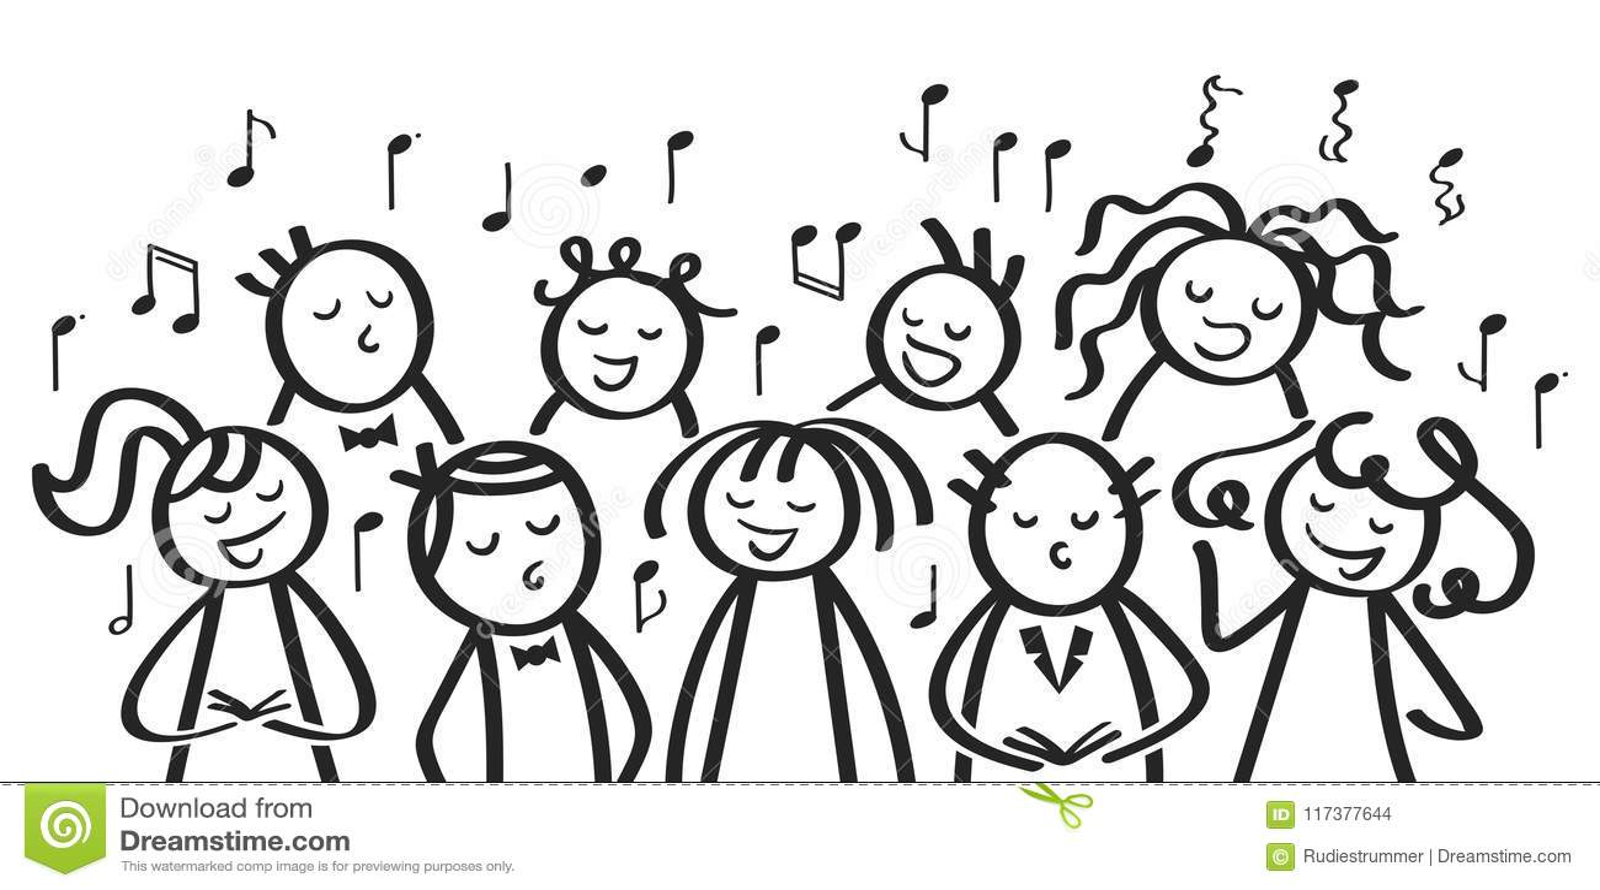 Singing Stock Illustrations